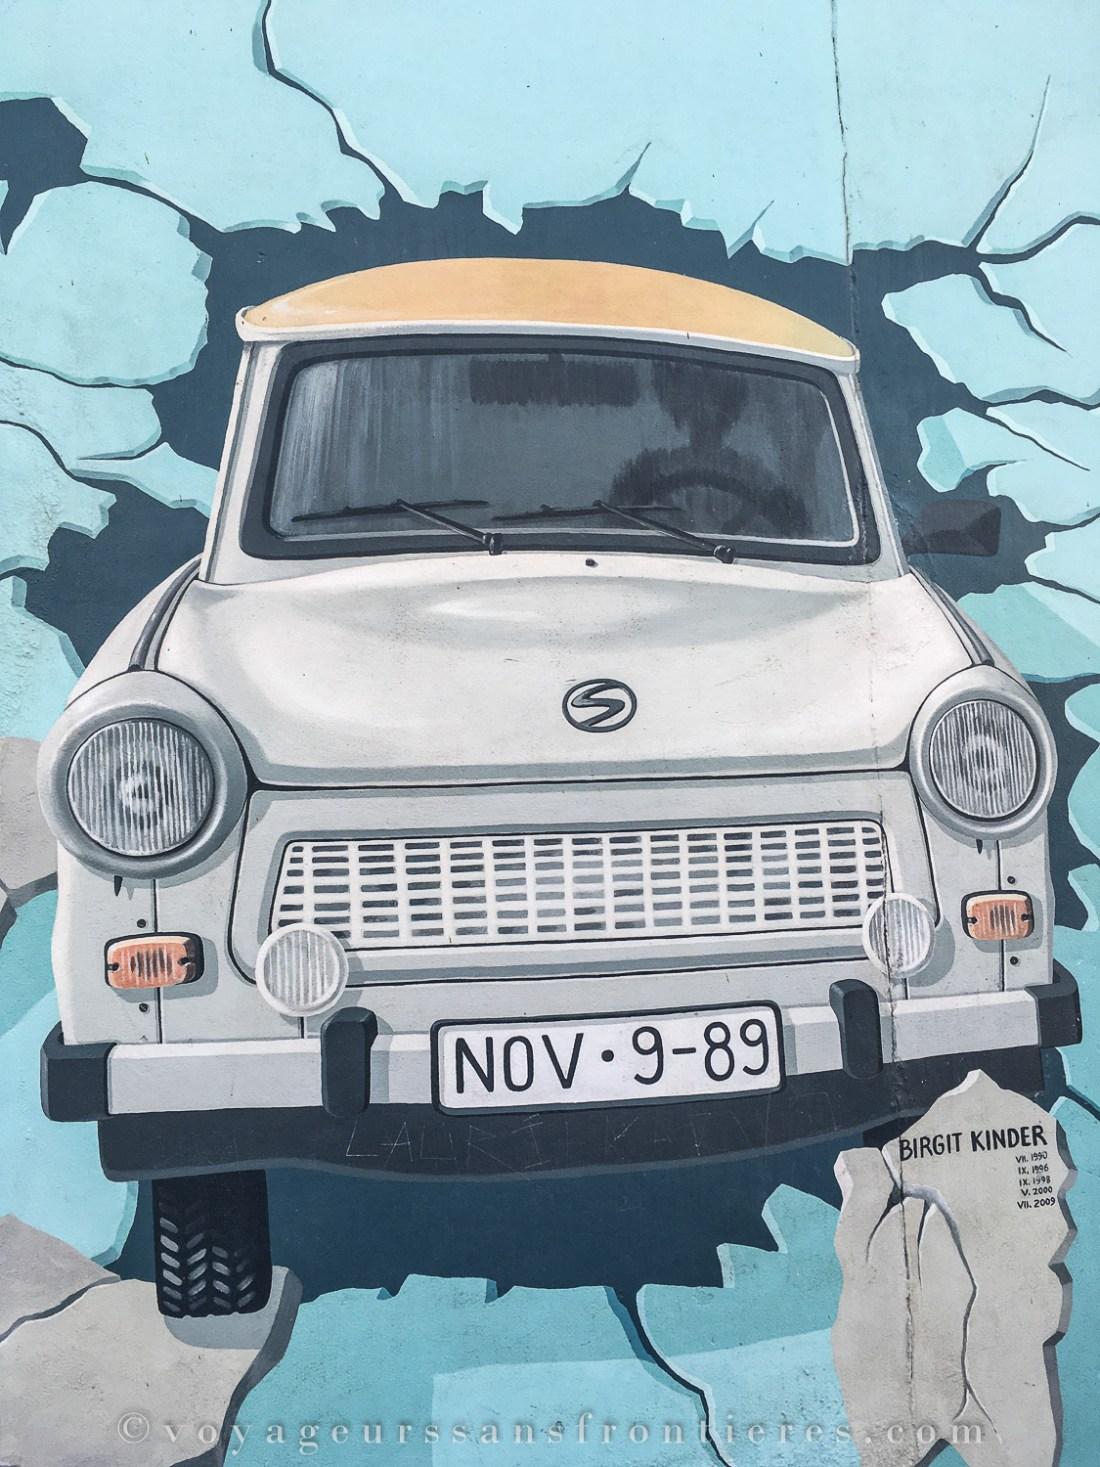 Street art piece at the East Side Gallery - Berlin, Germany